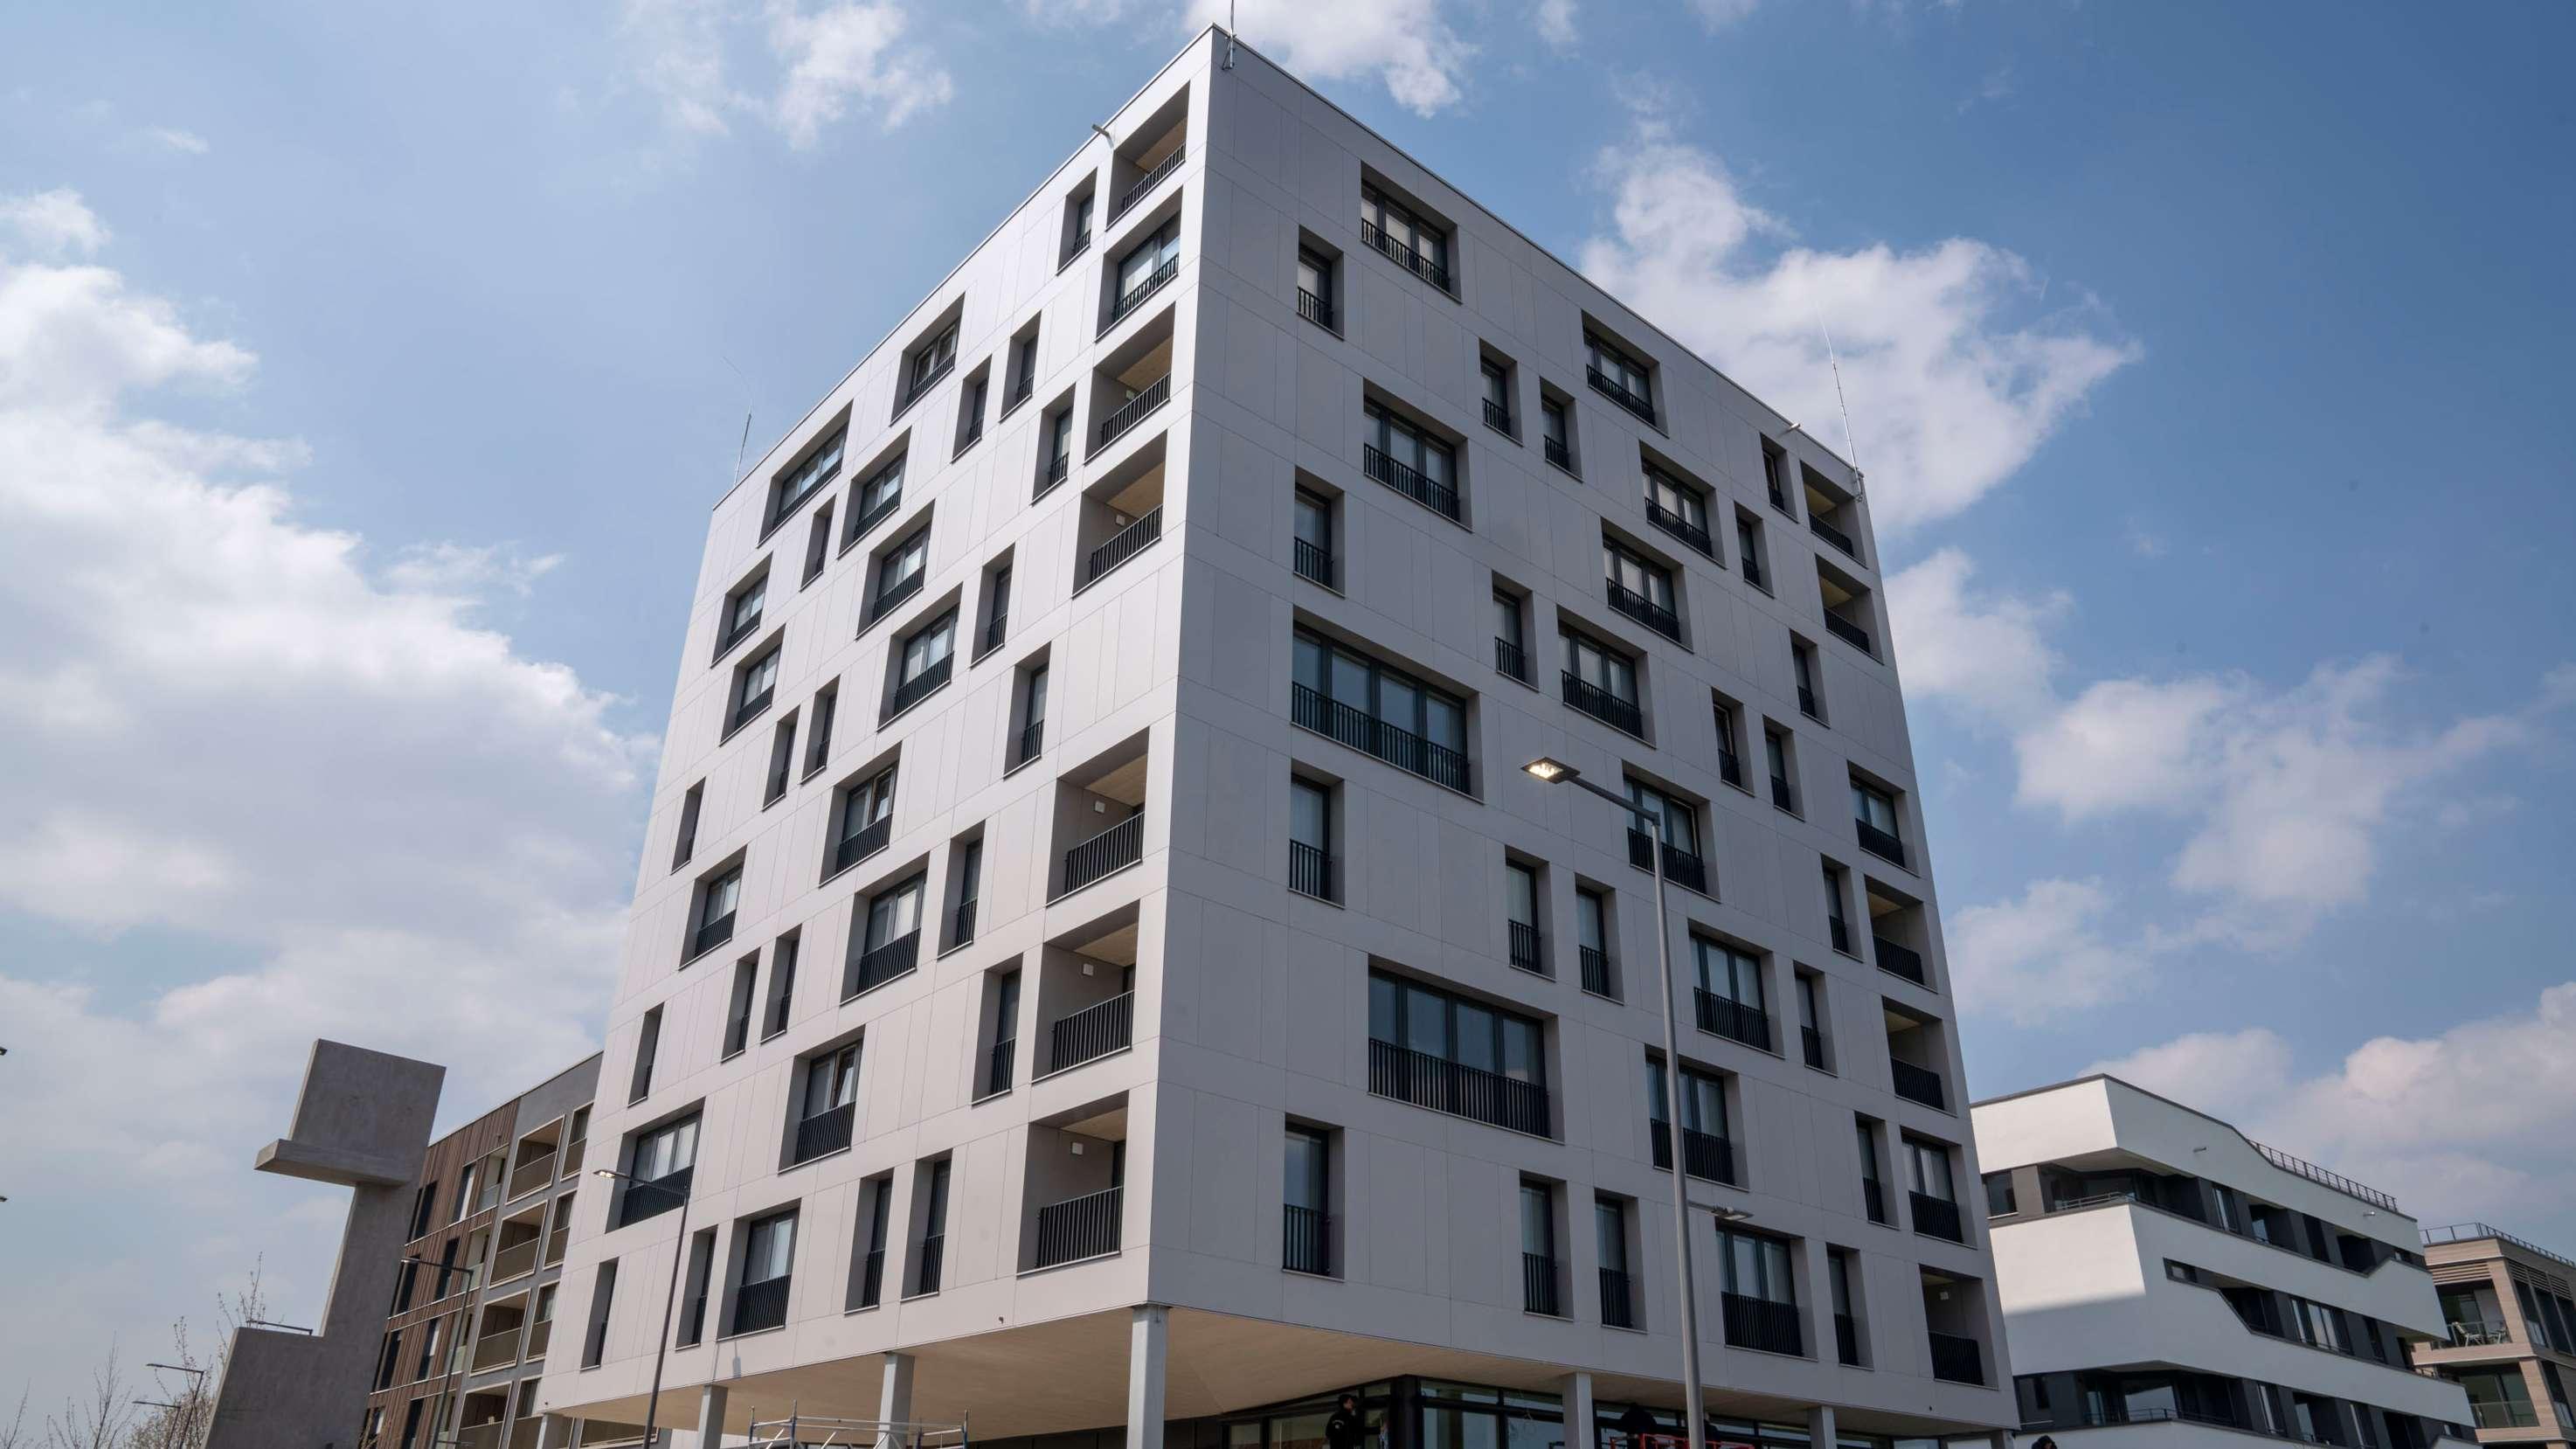 Holzhochhaus